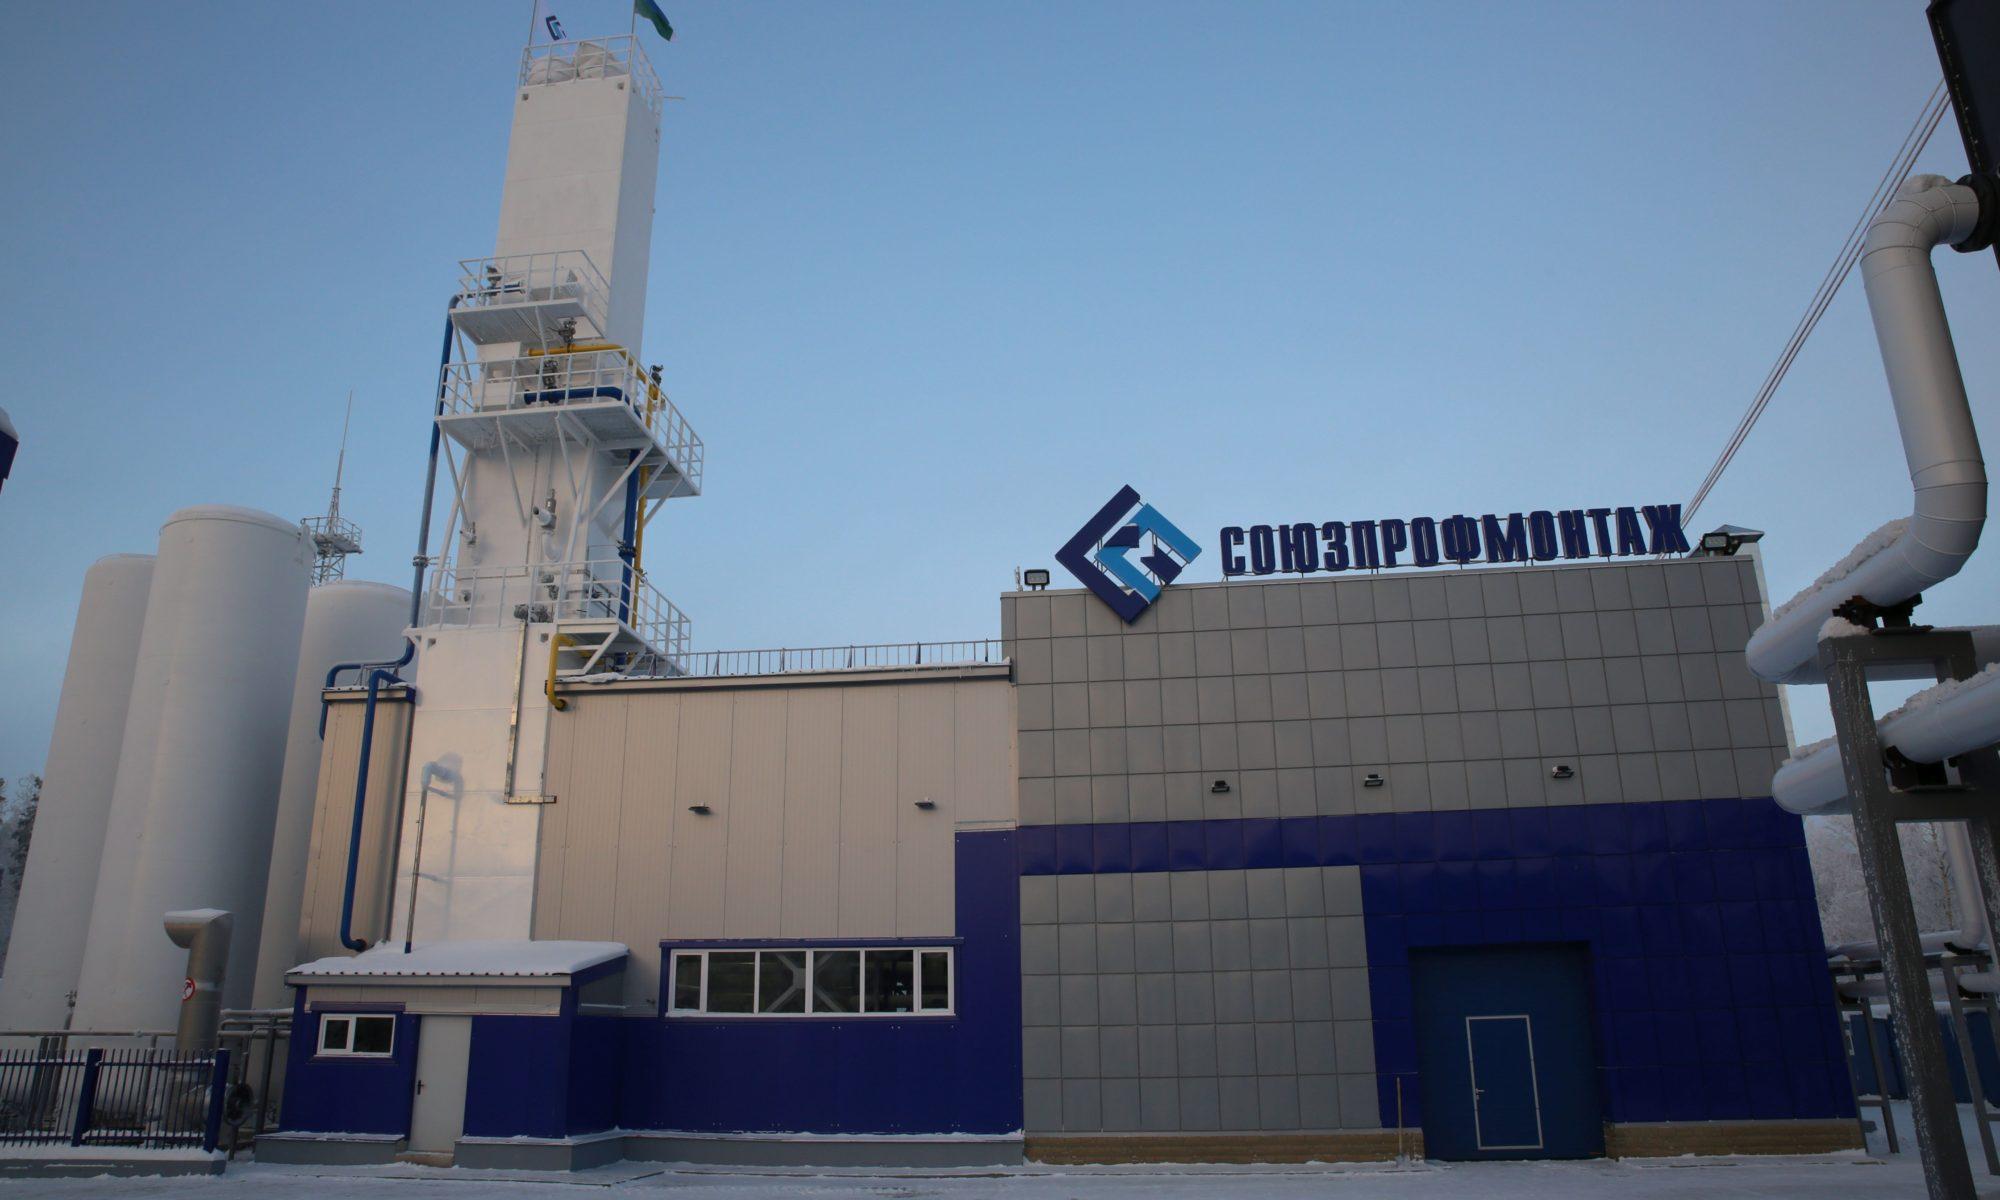 ООО Союзпрофмонтаж